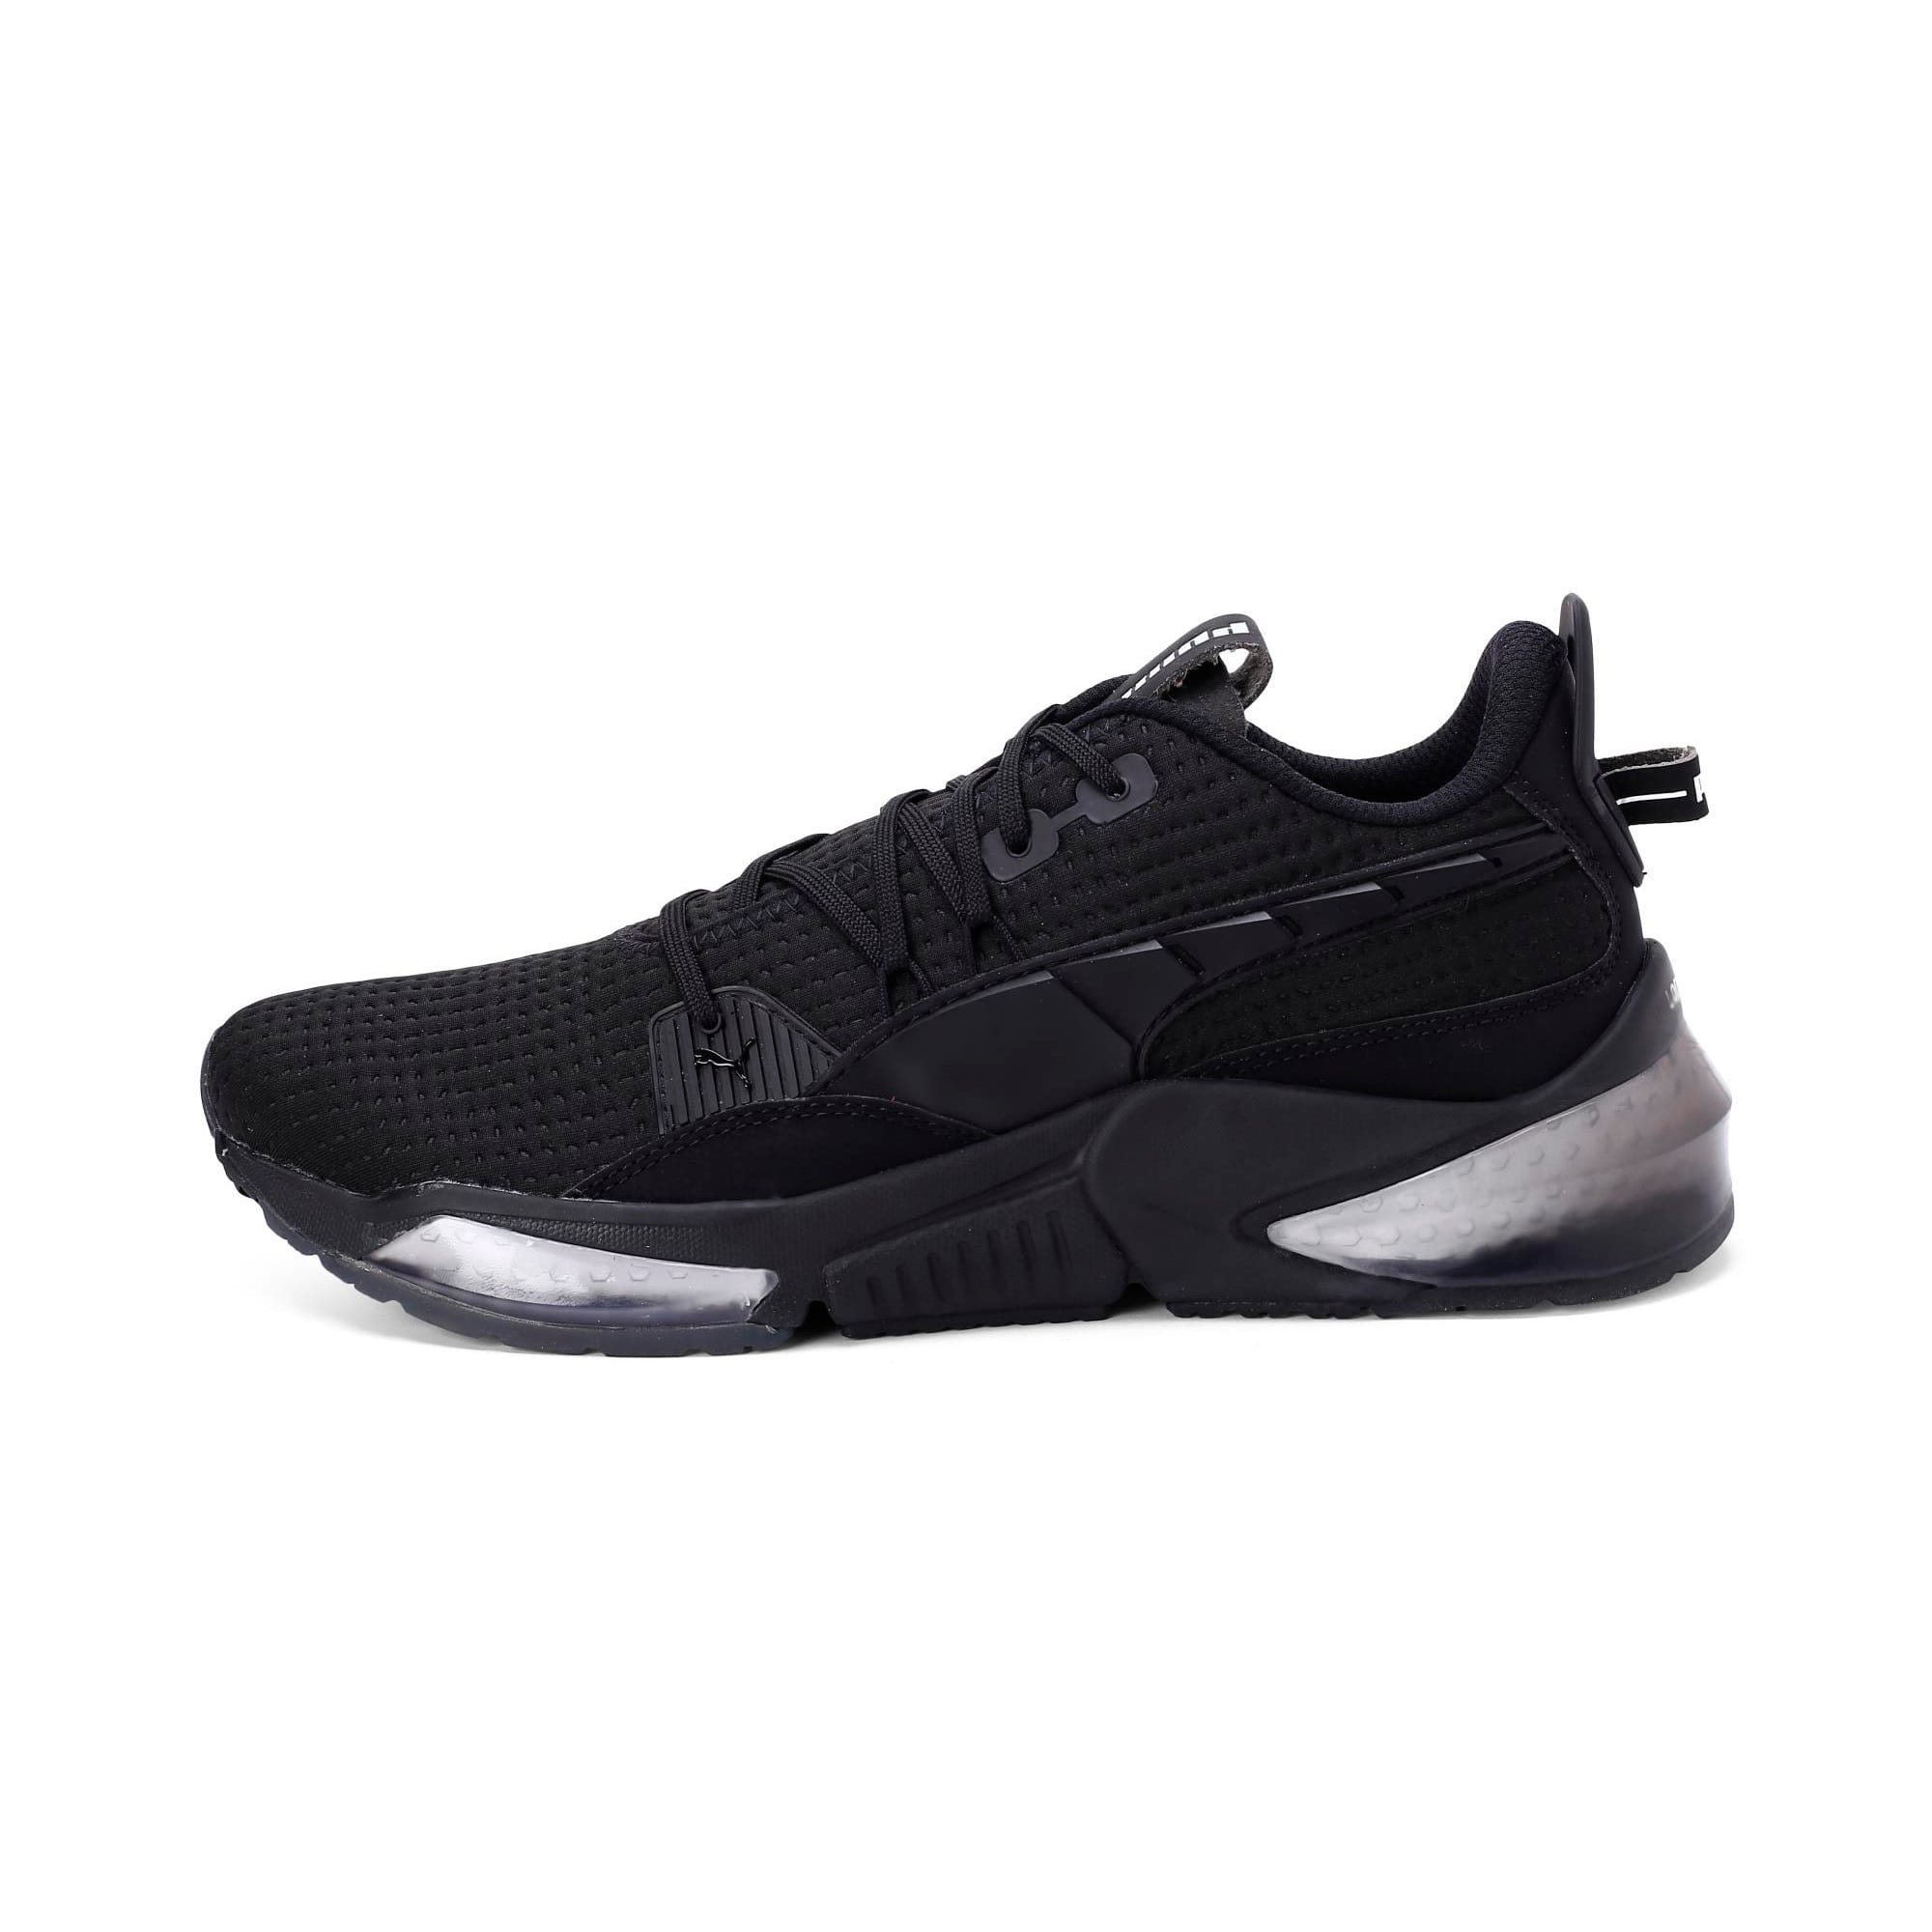 Thumbnail 1 of LQDCELL Optic Flight Suit Men's Running Shoes, Puma Black, medium-IND